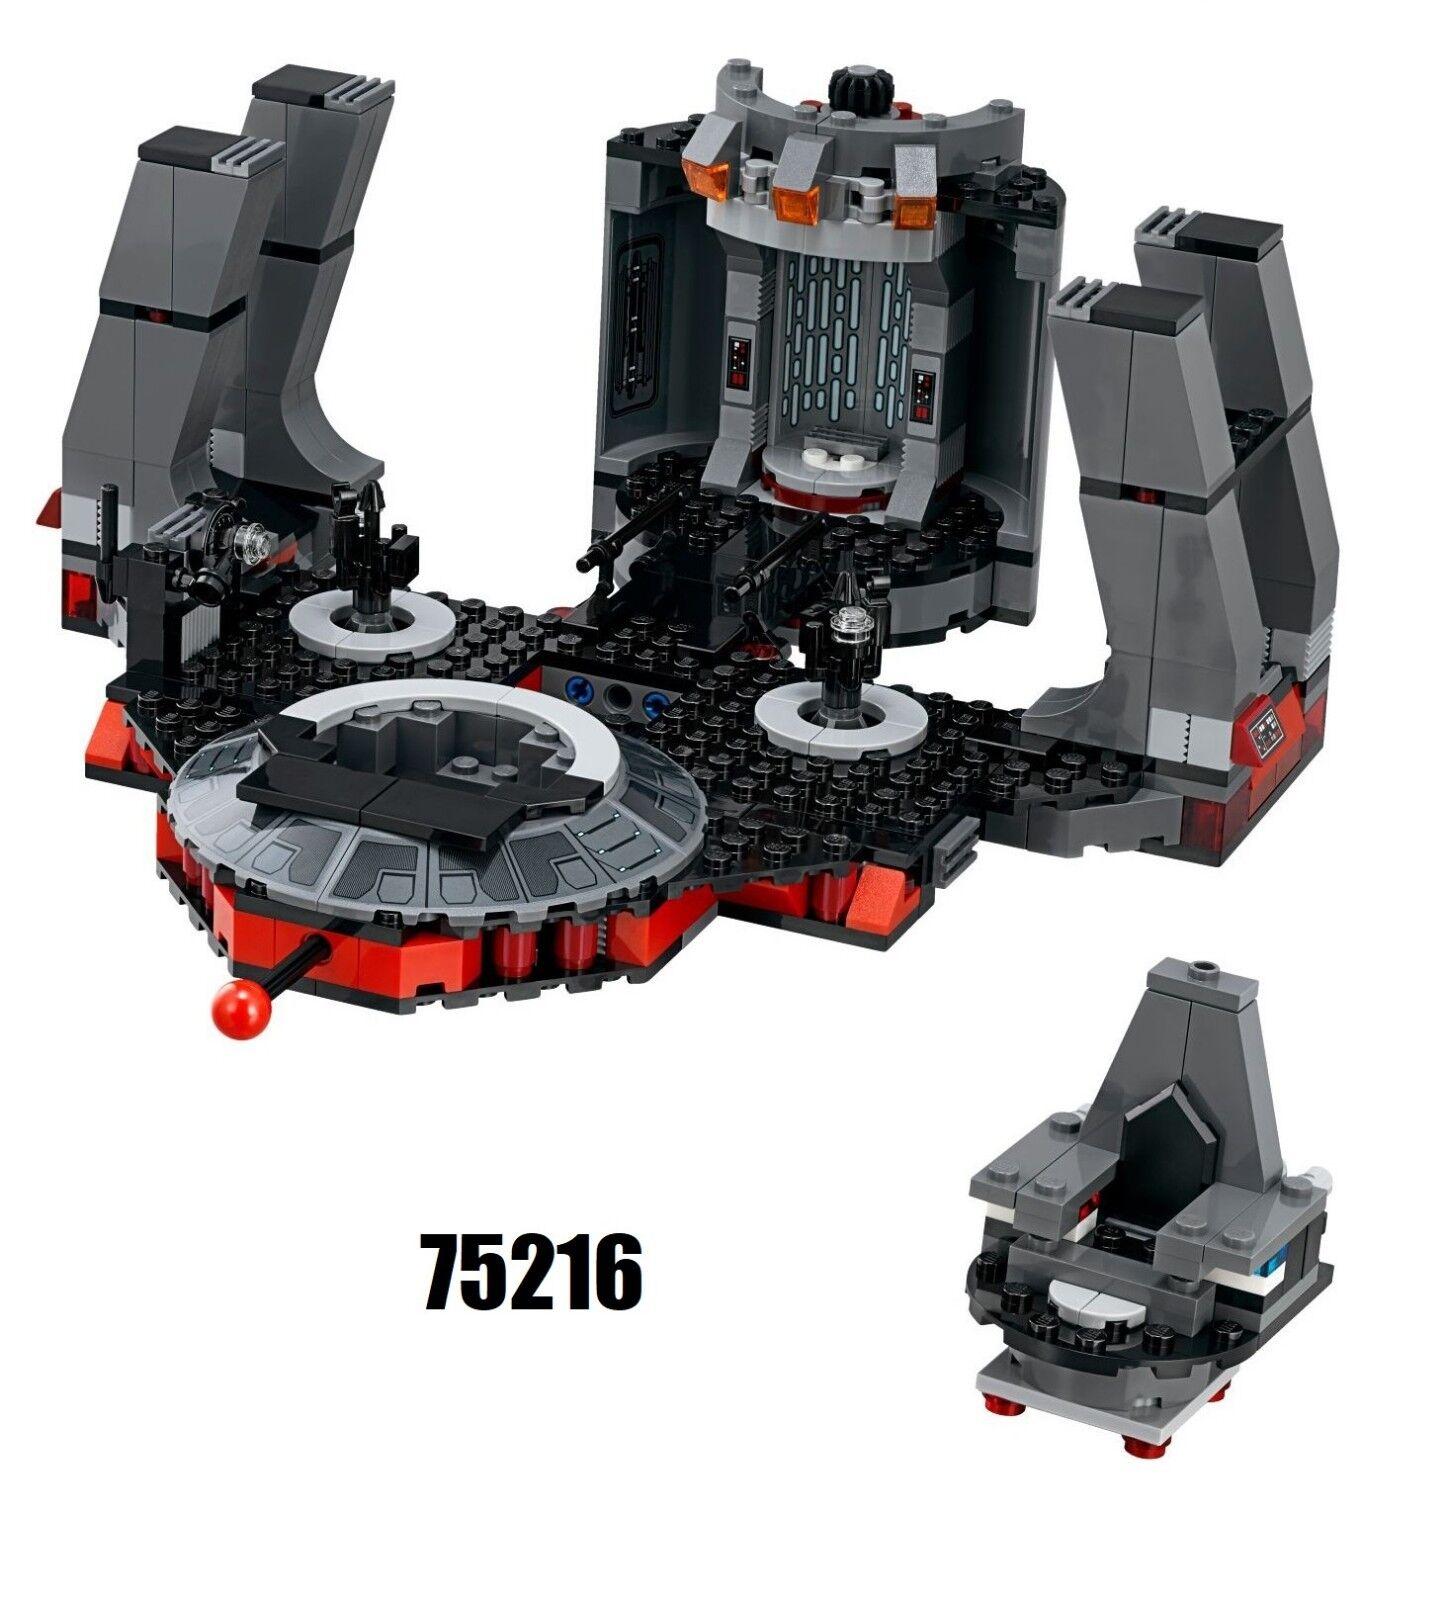 NEW  Lego Star Wars 75216 Snoke's Throne Room  NO MINIFIGURES